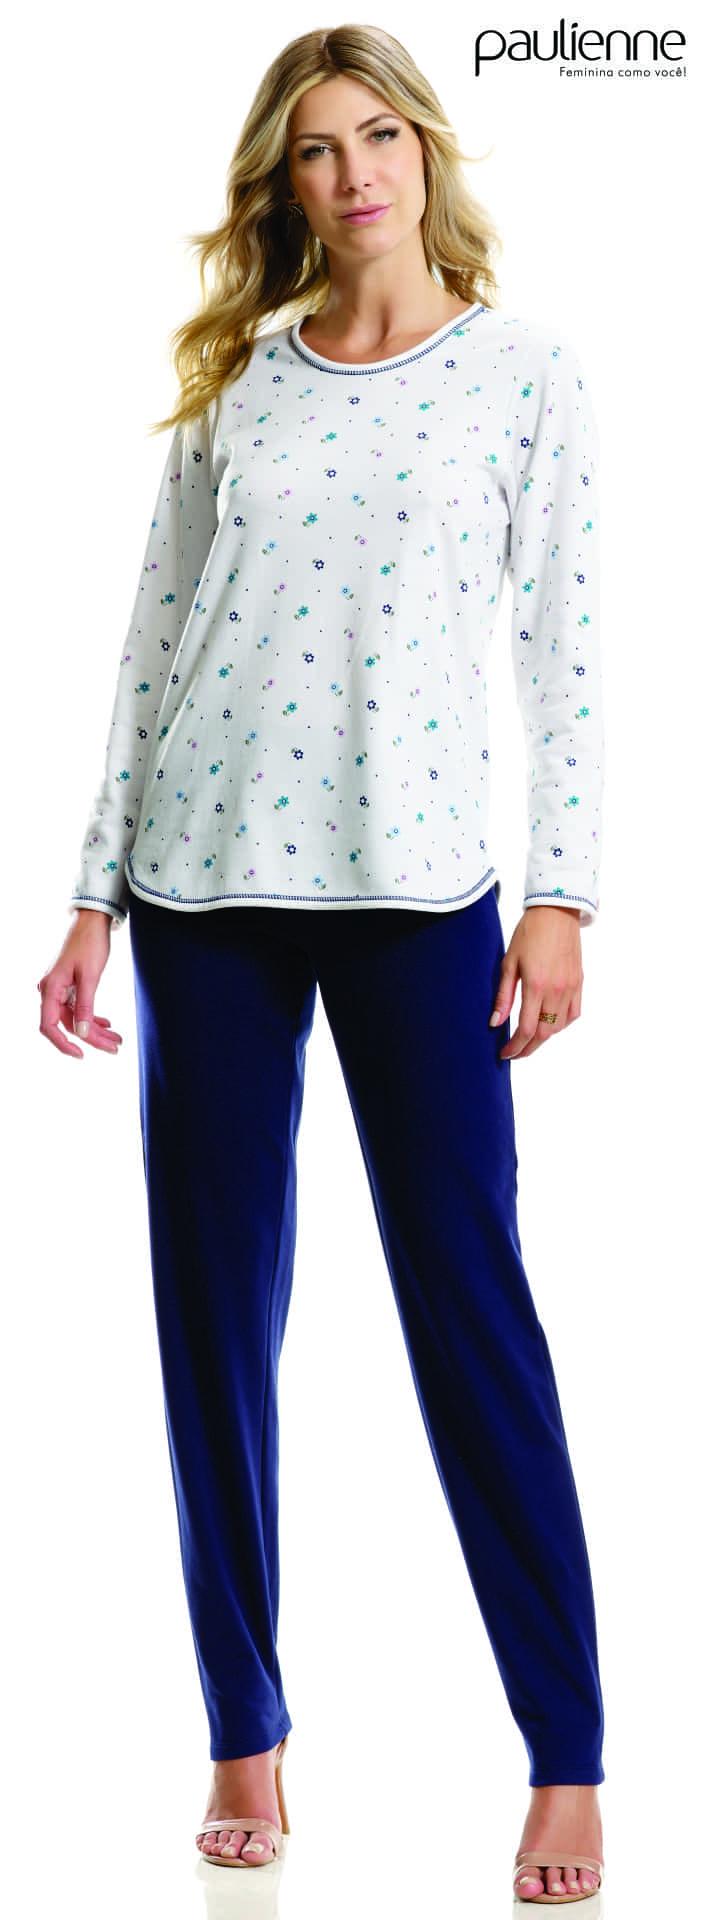 Pijama Feminino Adulto Longo Paulienne Flanelado estampa Floral A90 22962